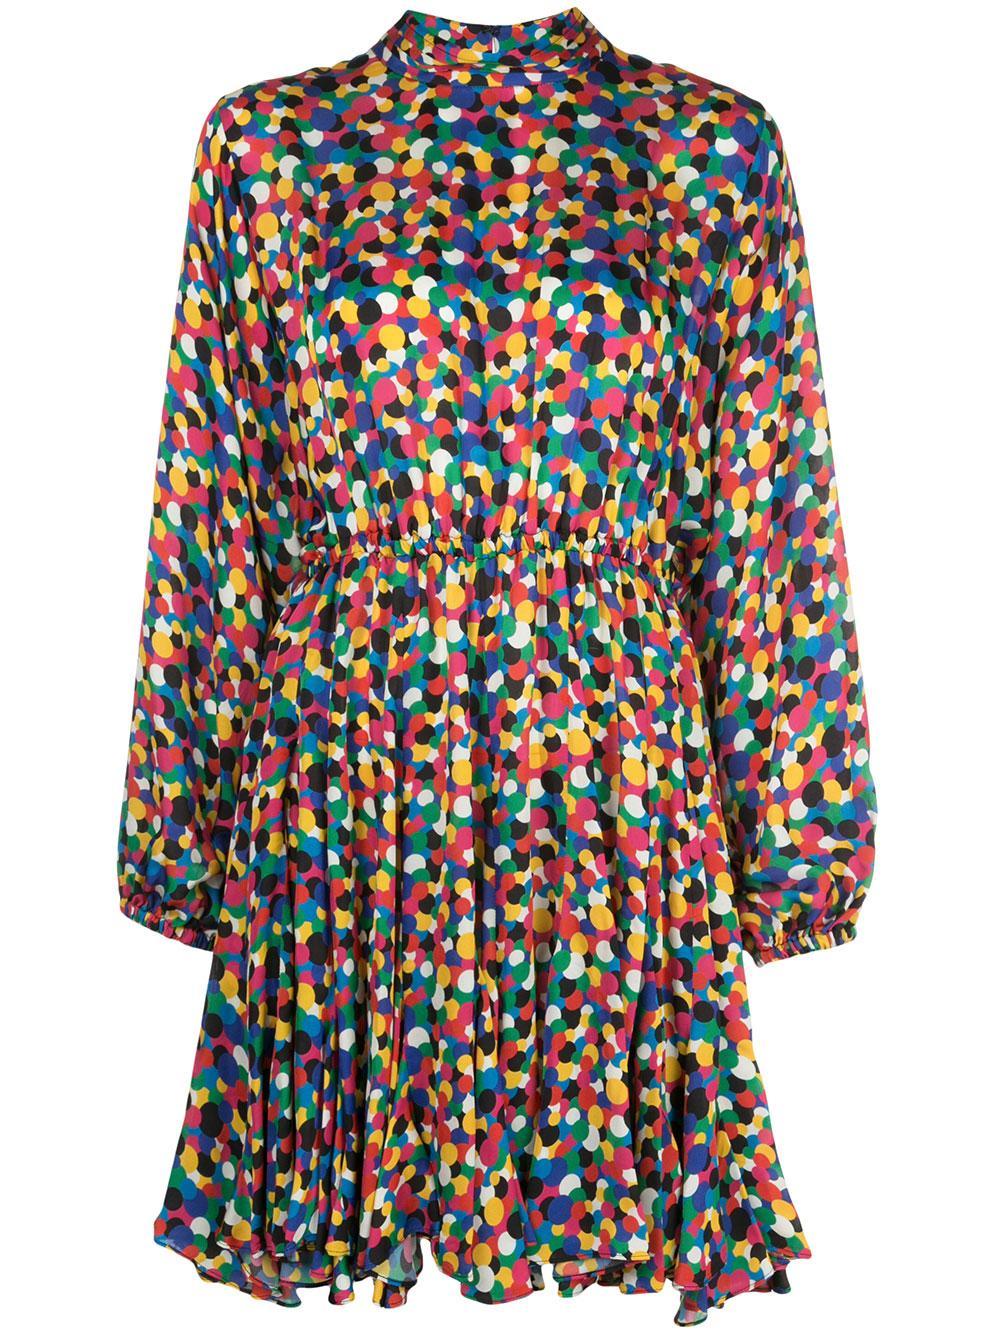 Caroline Confetti Dress